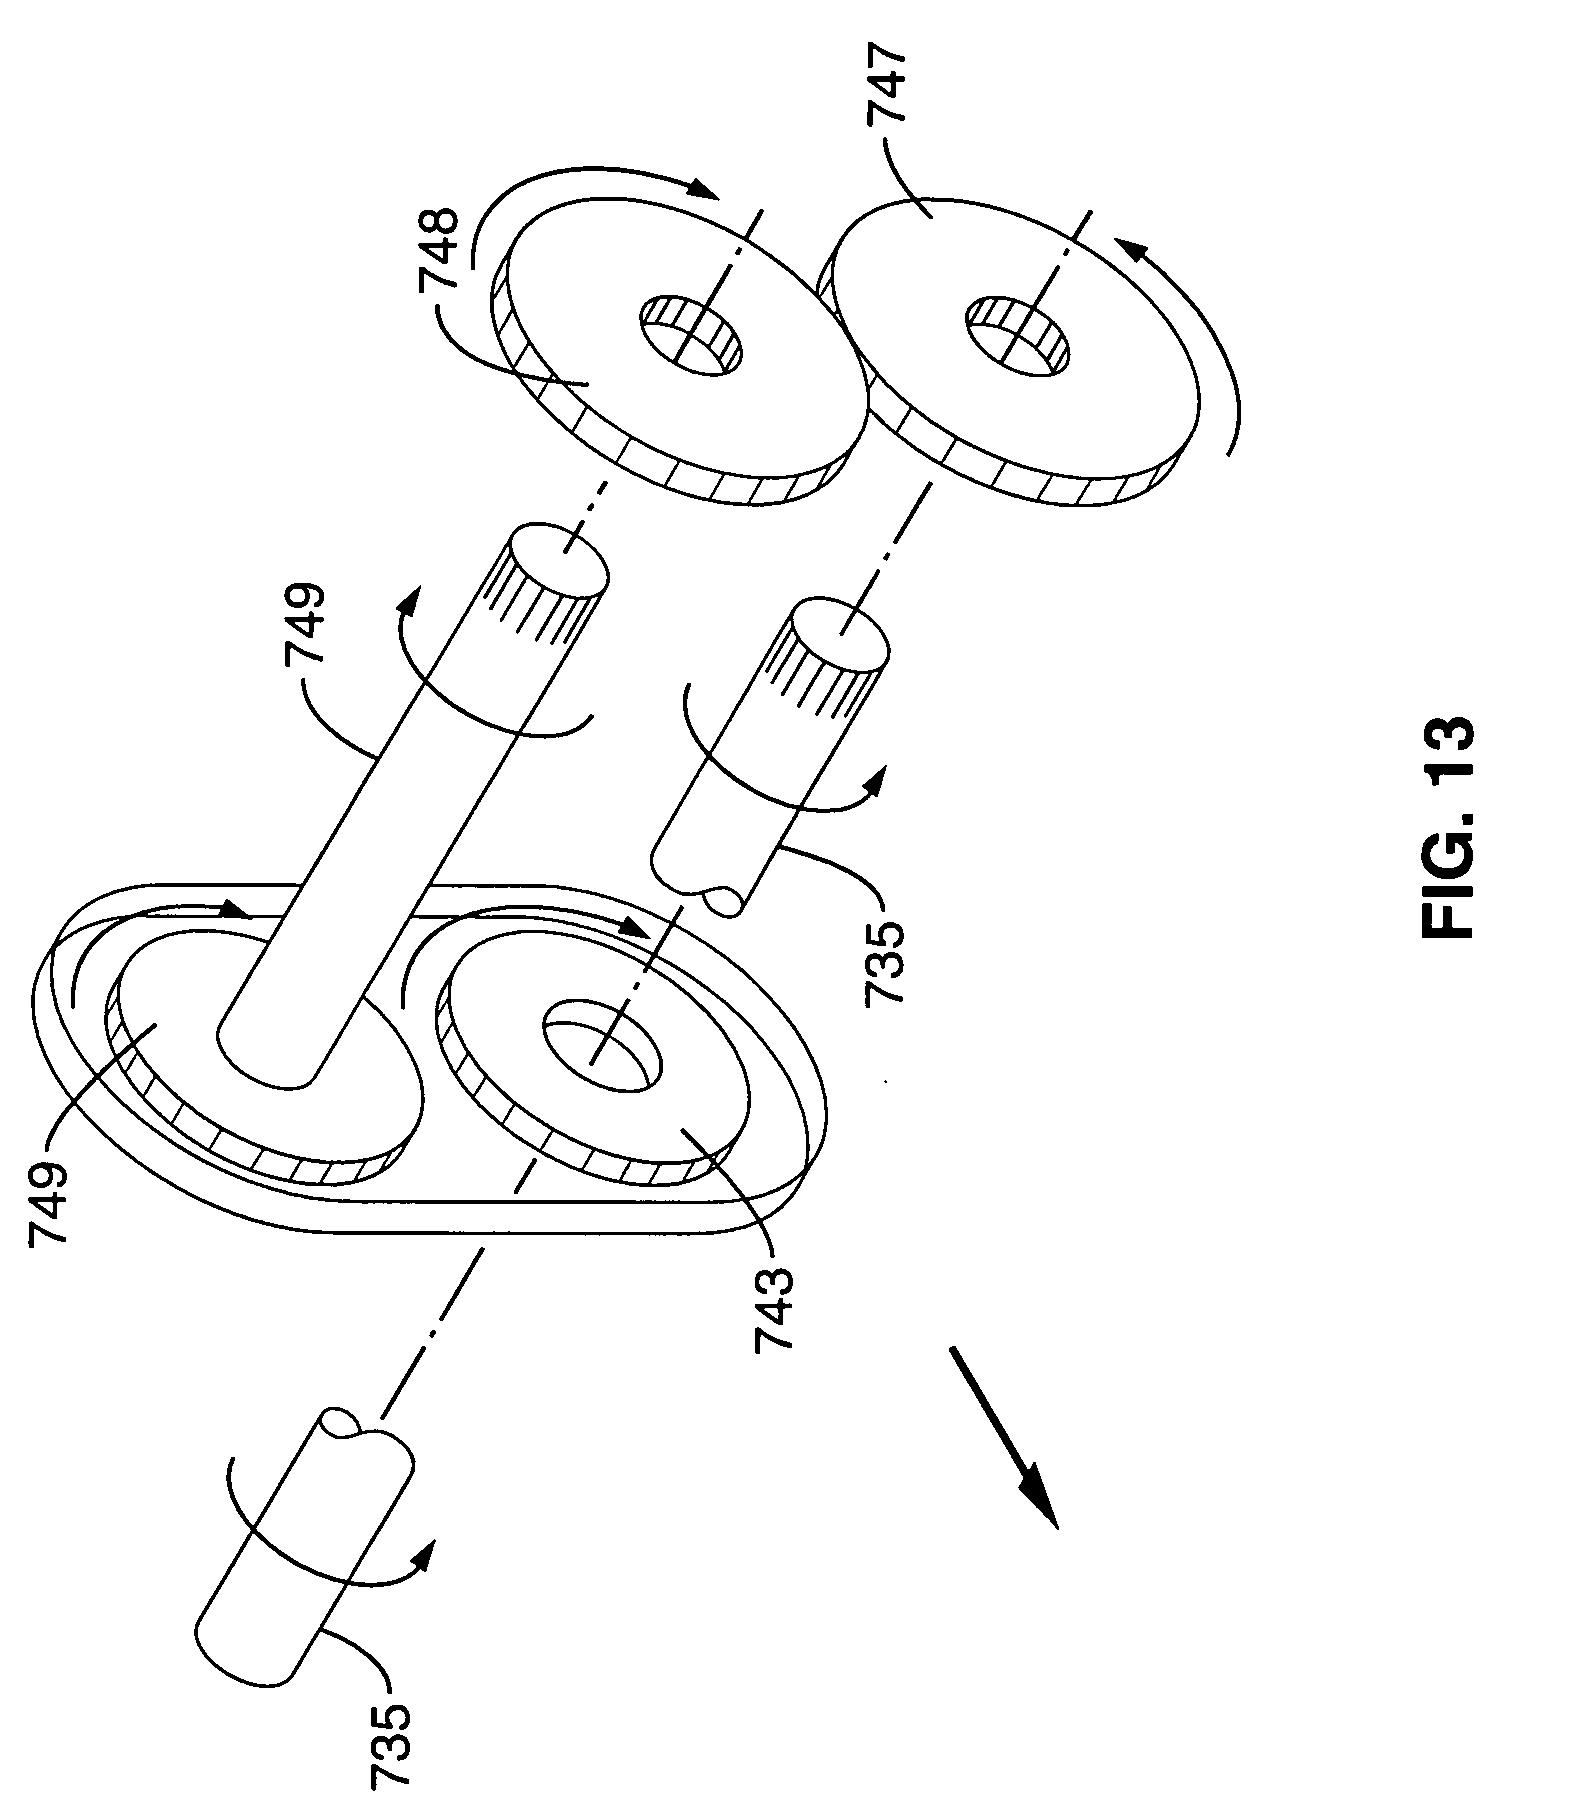 mini usb cable wiring diagram mini usb plug wiring diagram